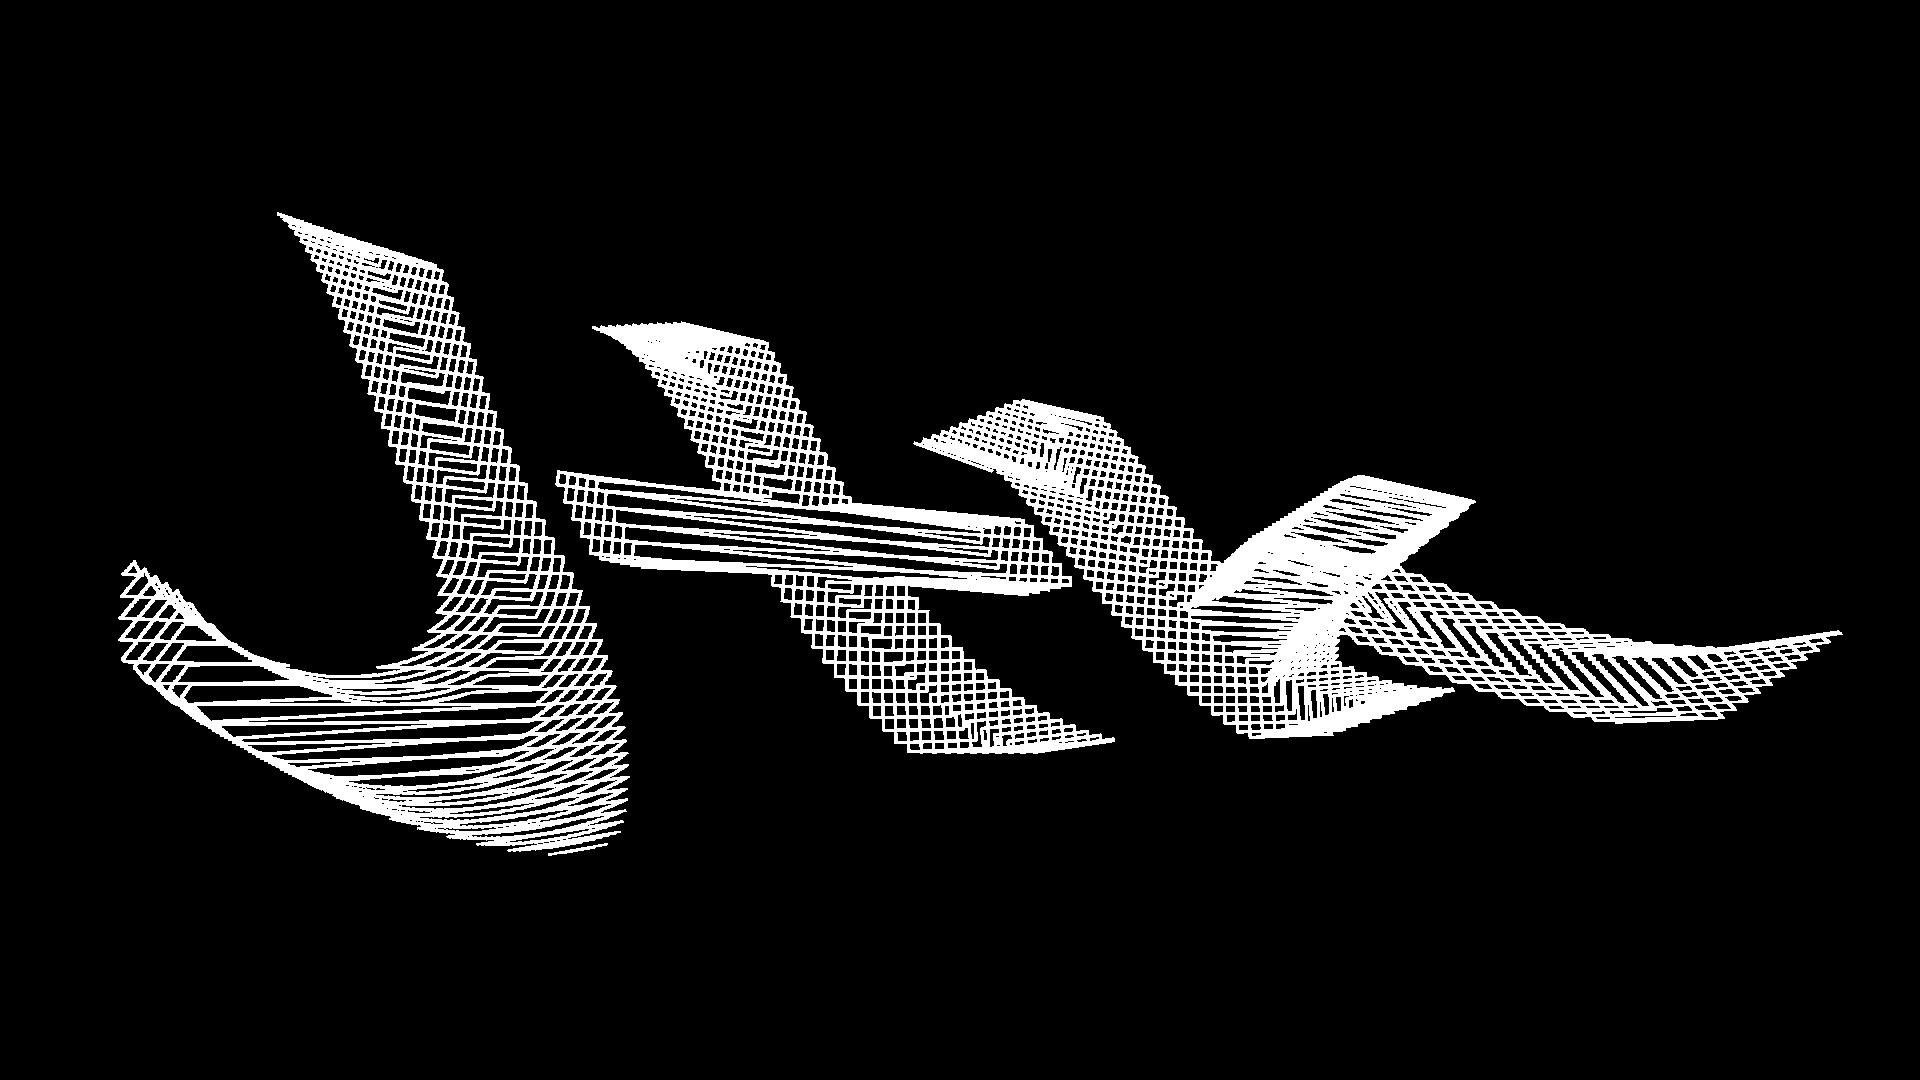 jk_00370